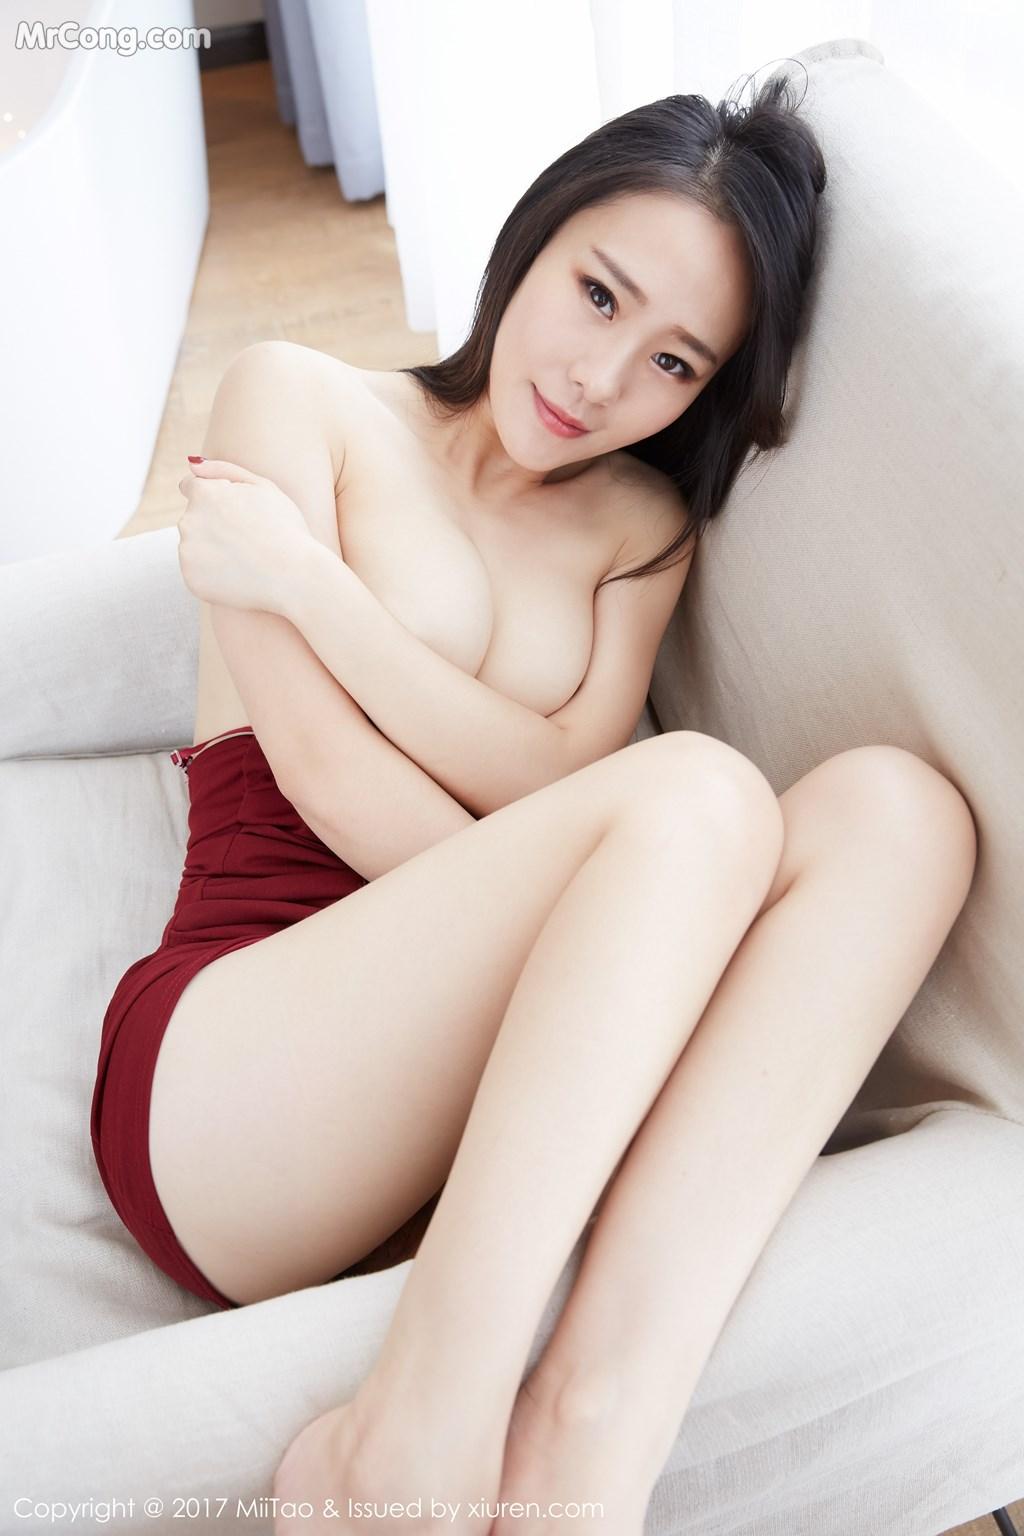 Image MiiTao-Vol.079-Yu-Wei-MrCong.com-024 in post MiiTao Vol.079: Người mẫu Yu Wei (雨薇) (54 ảnh)